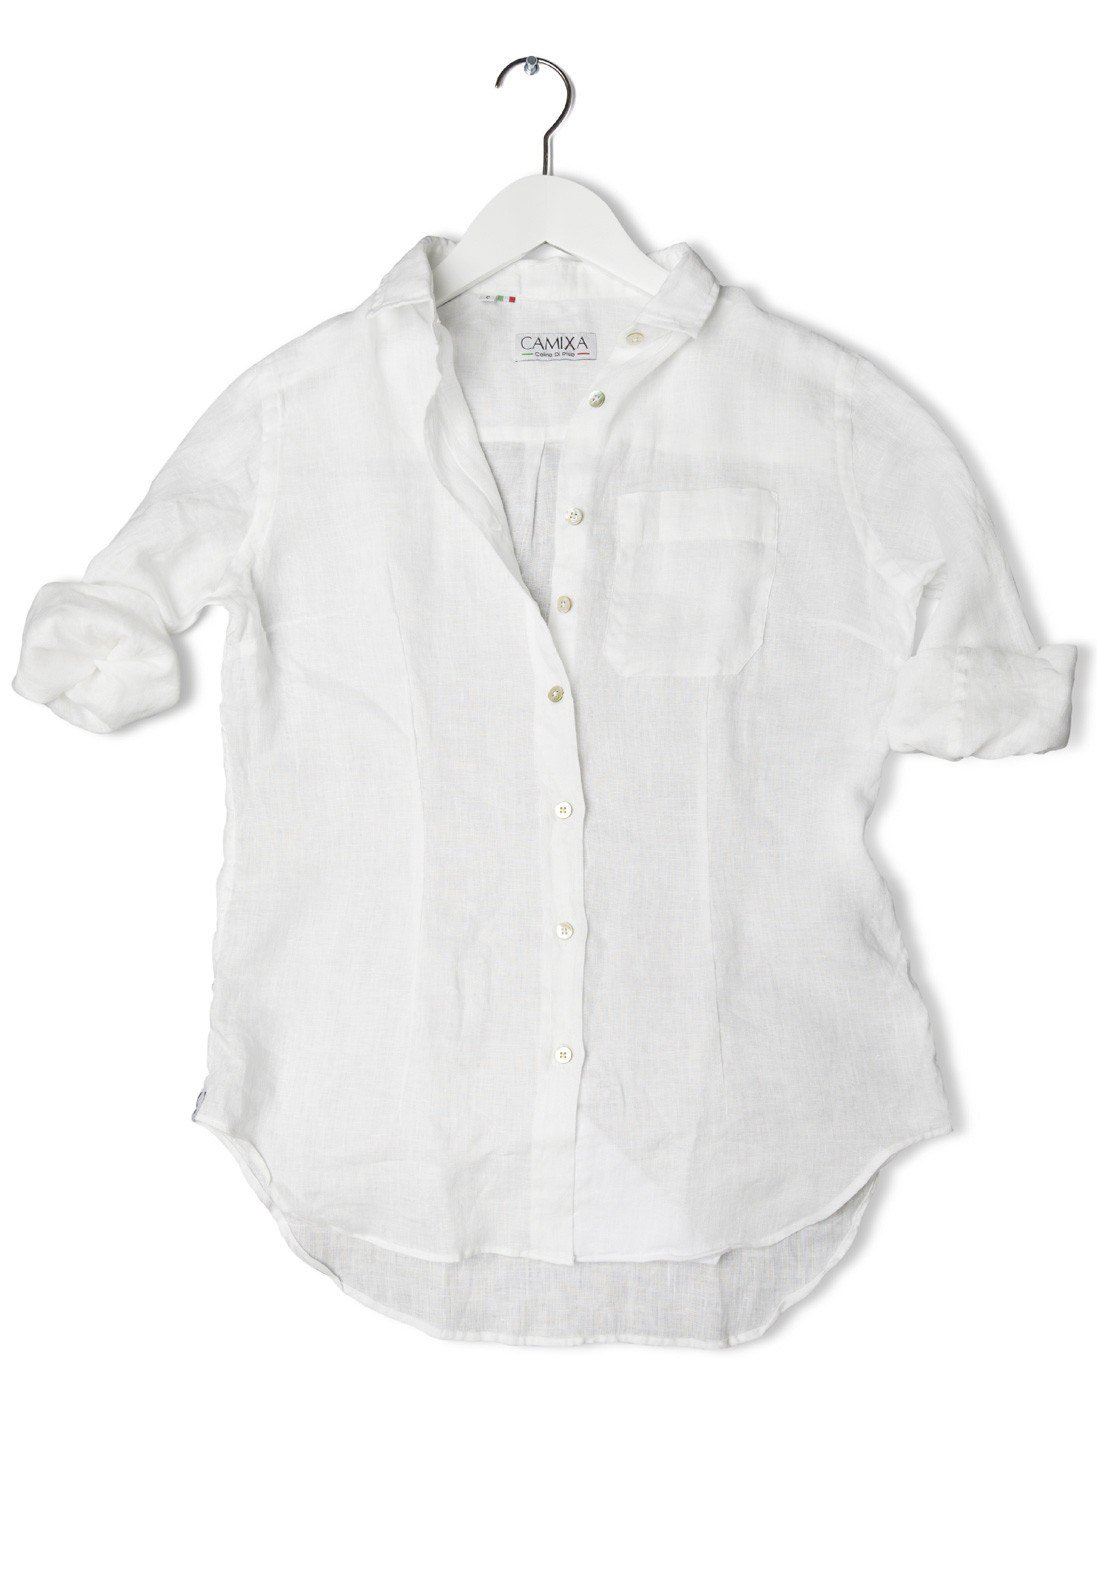 Camixa Lina White Linen Shirt